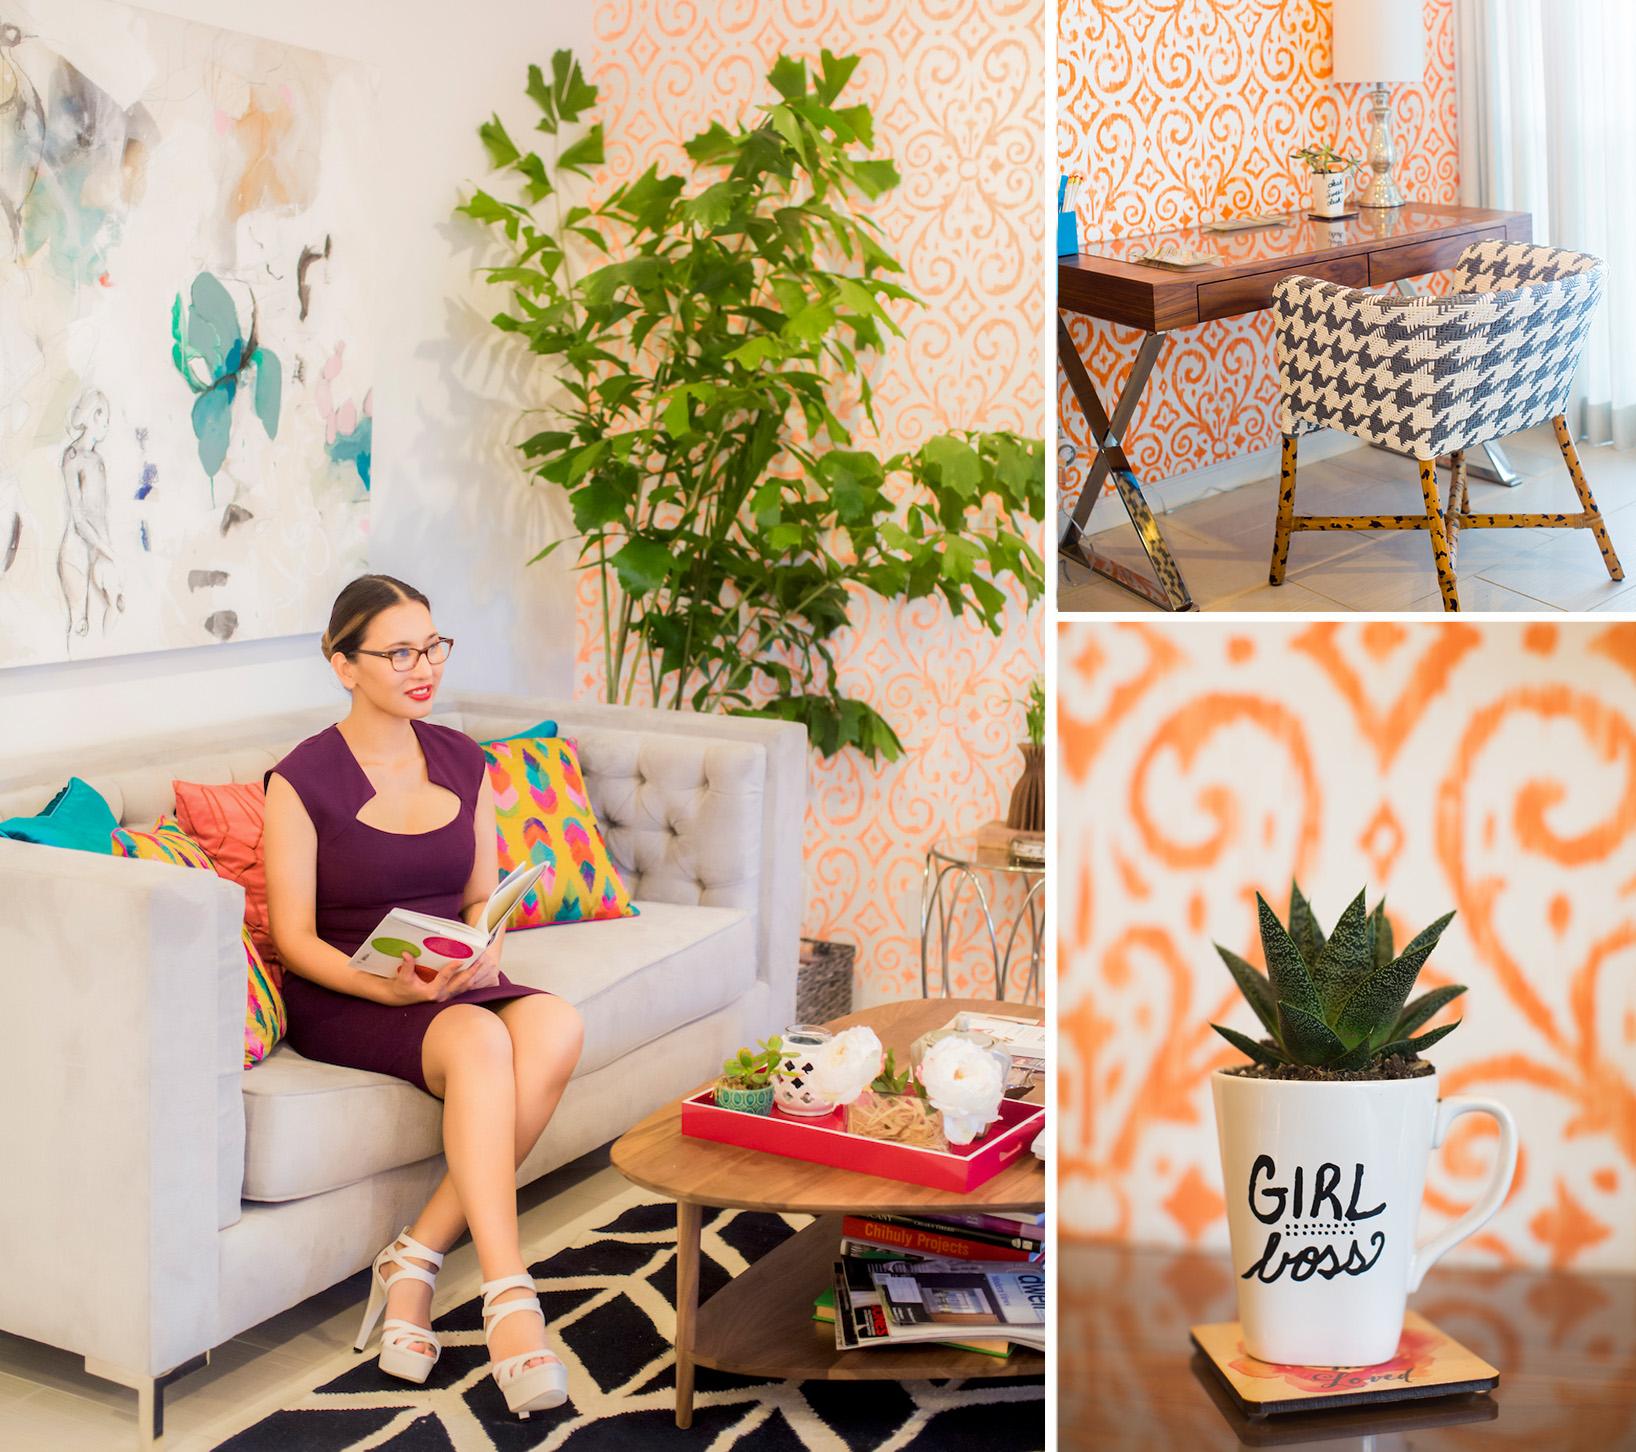 Colorful-Office-Pegs-Girl-Boss-Artsy-office-desk